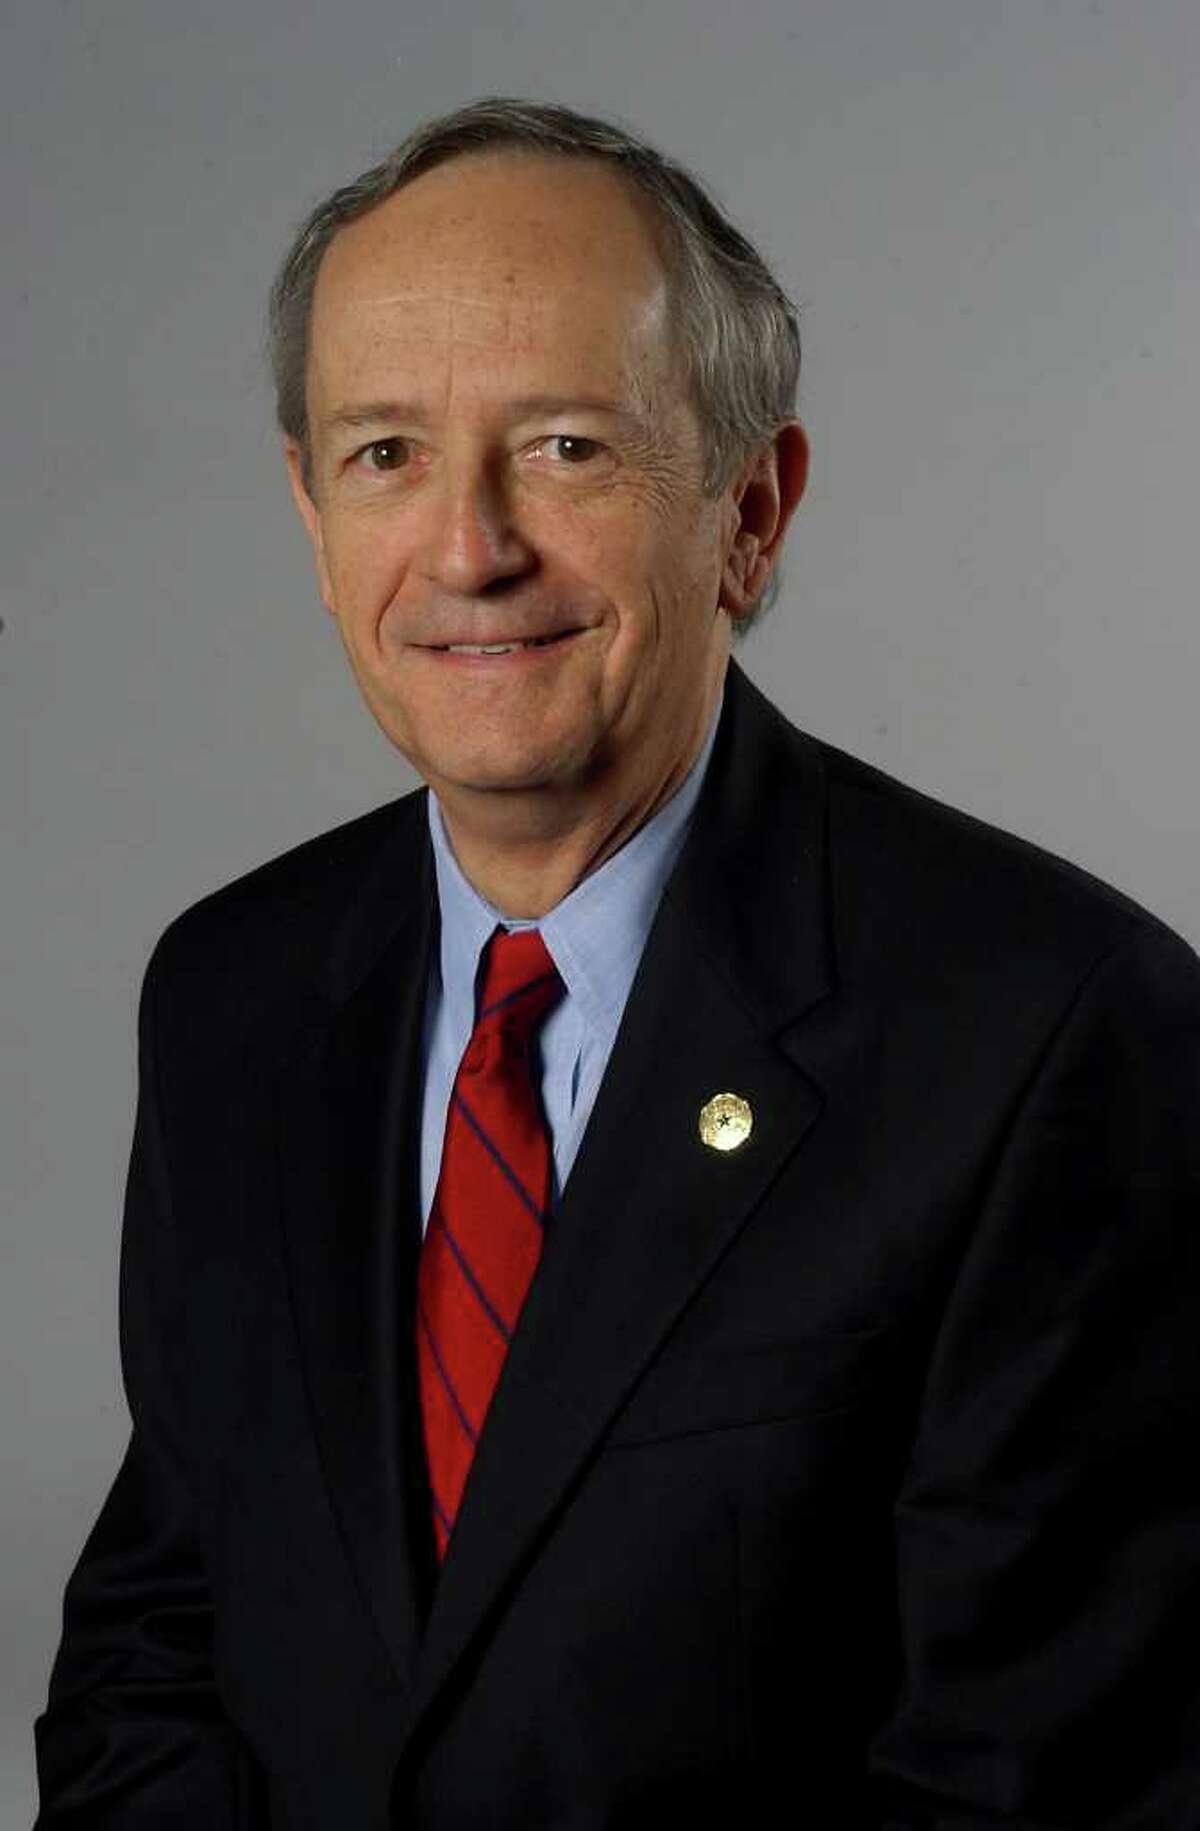 Sen. Jeff Wentworth, R-San Antonio, on Wednesday, February 2, 2005. (AP Photo)